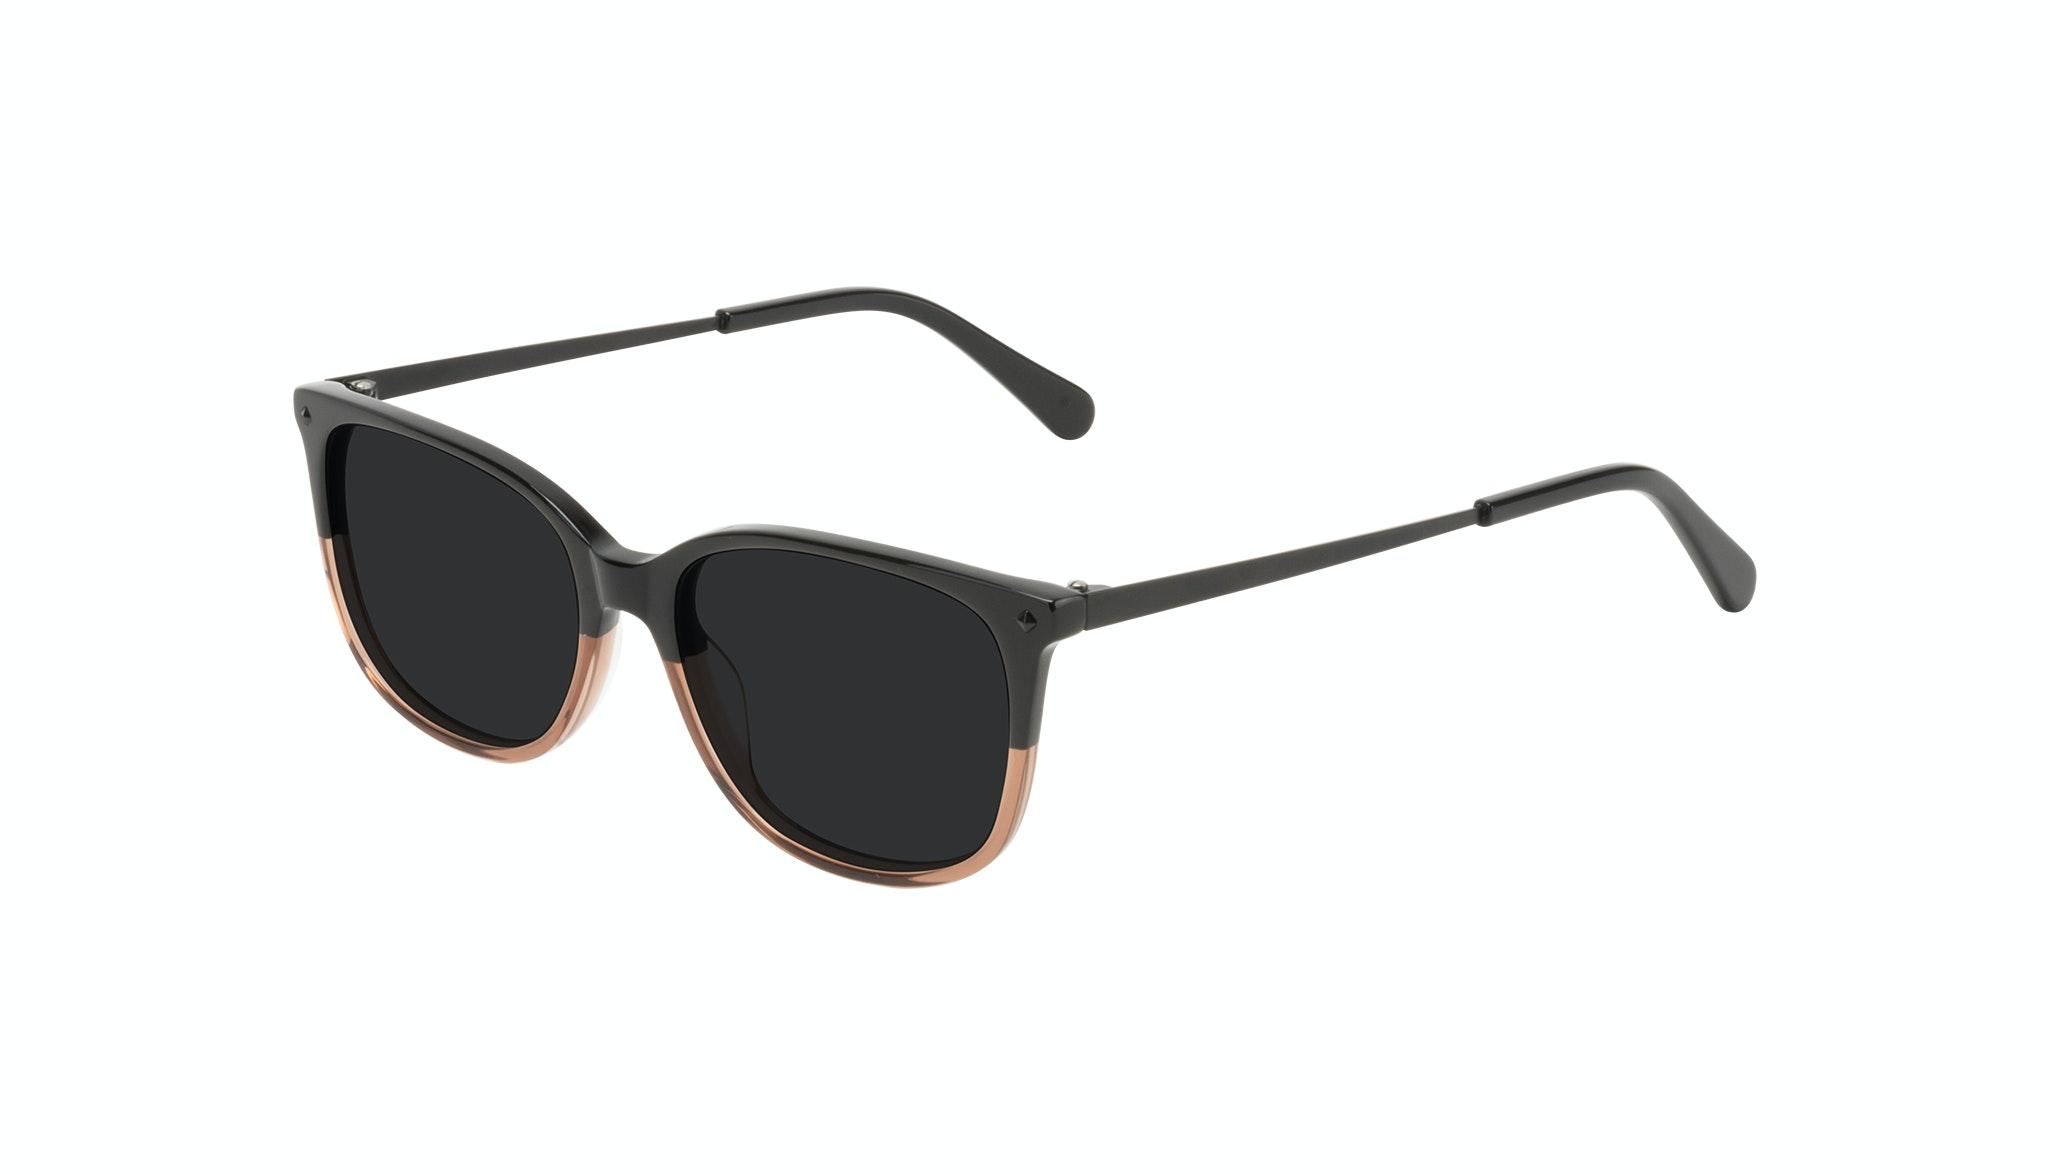 Affordable Fashion Glasses Rectangle Square Sunglasses Women Refine Wood Terra Tilt